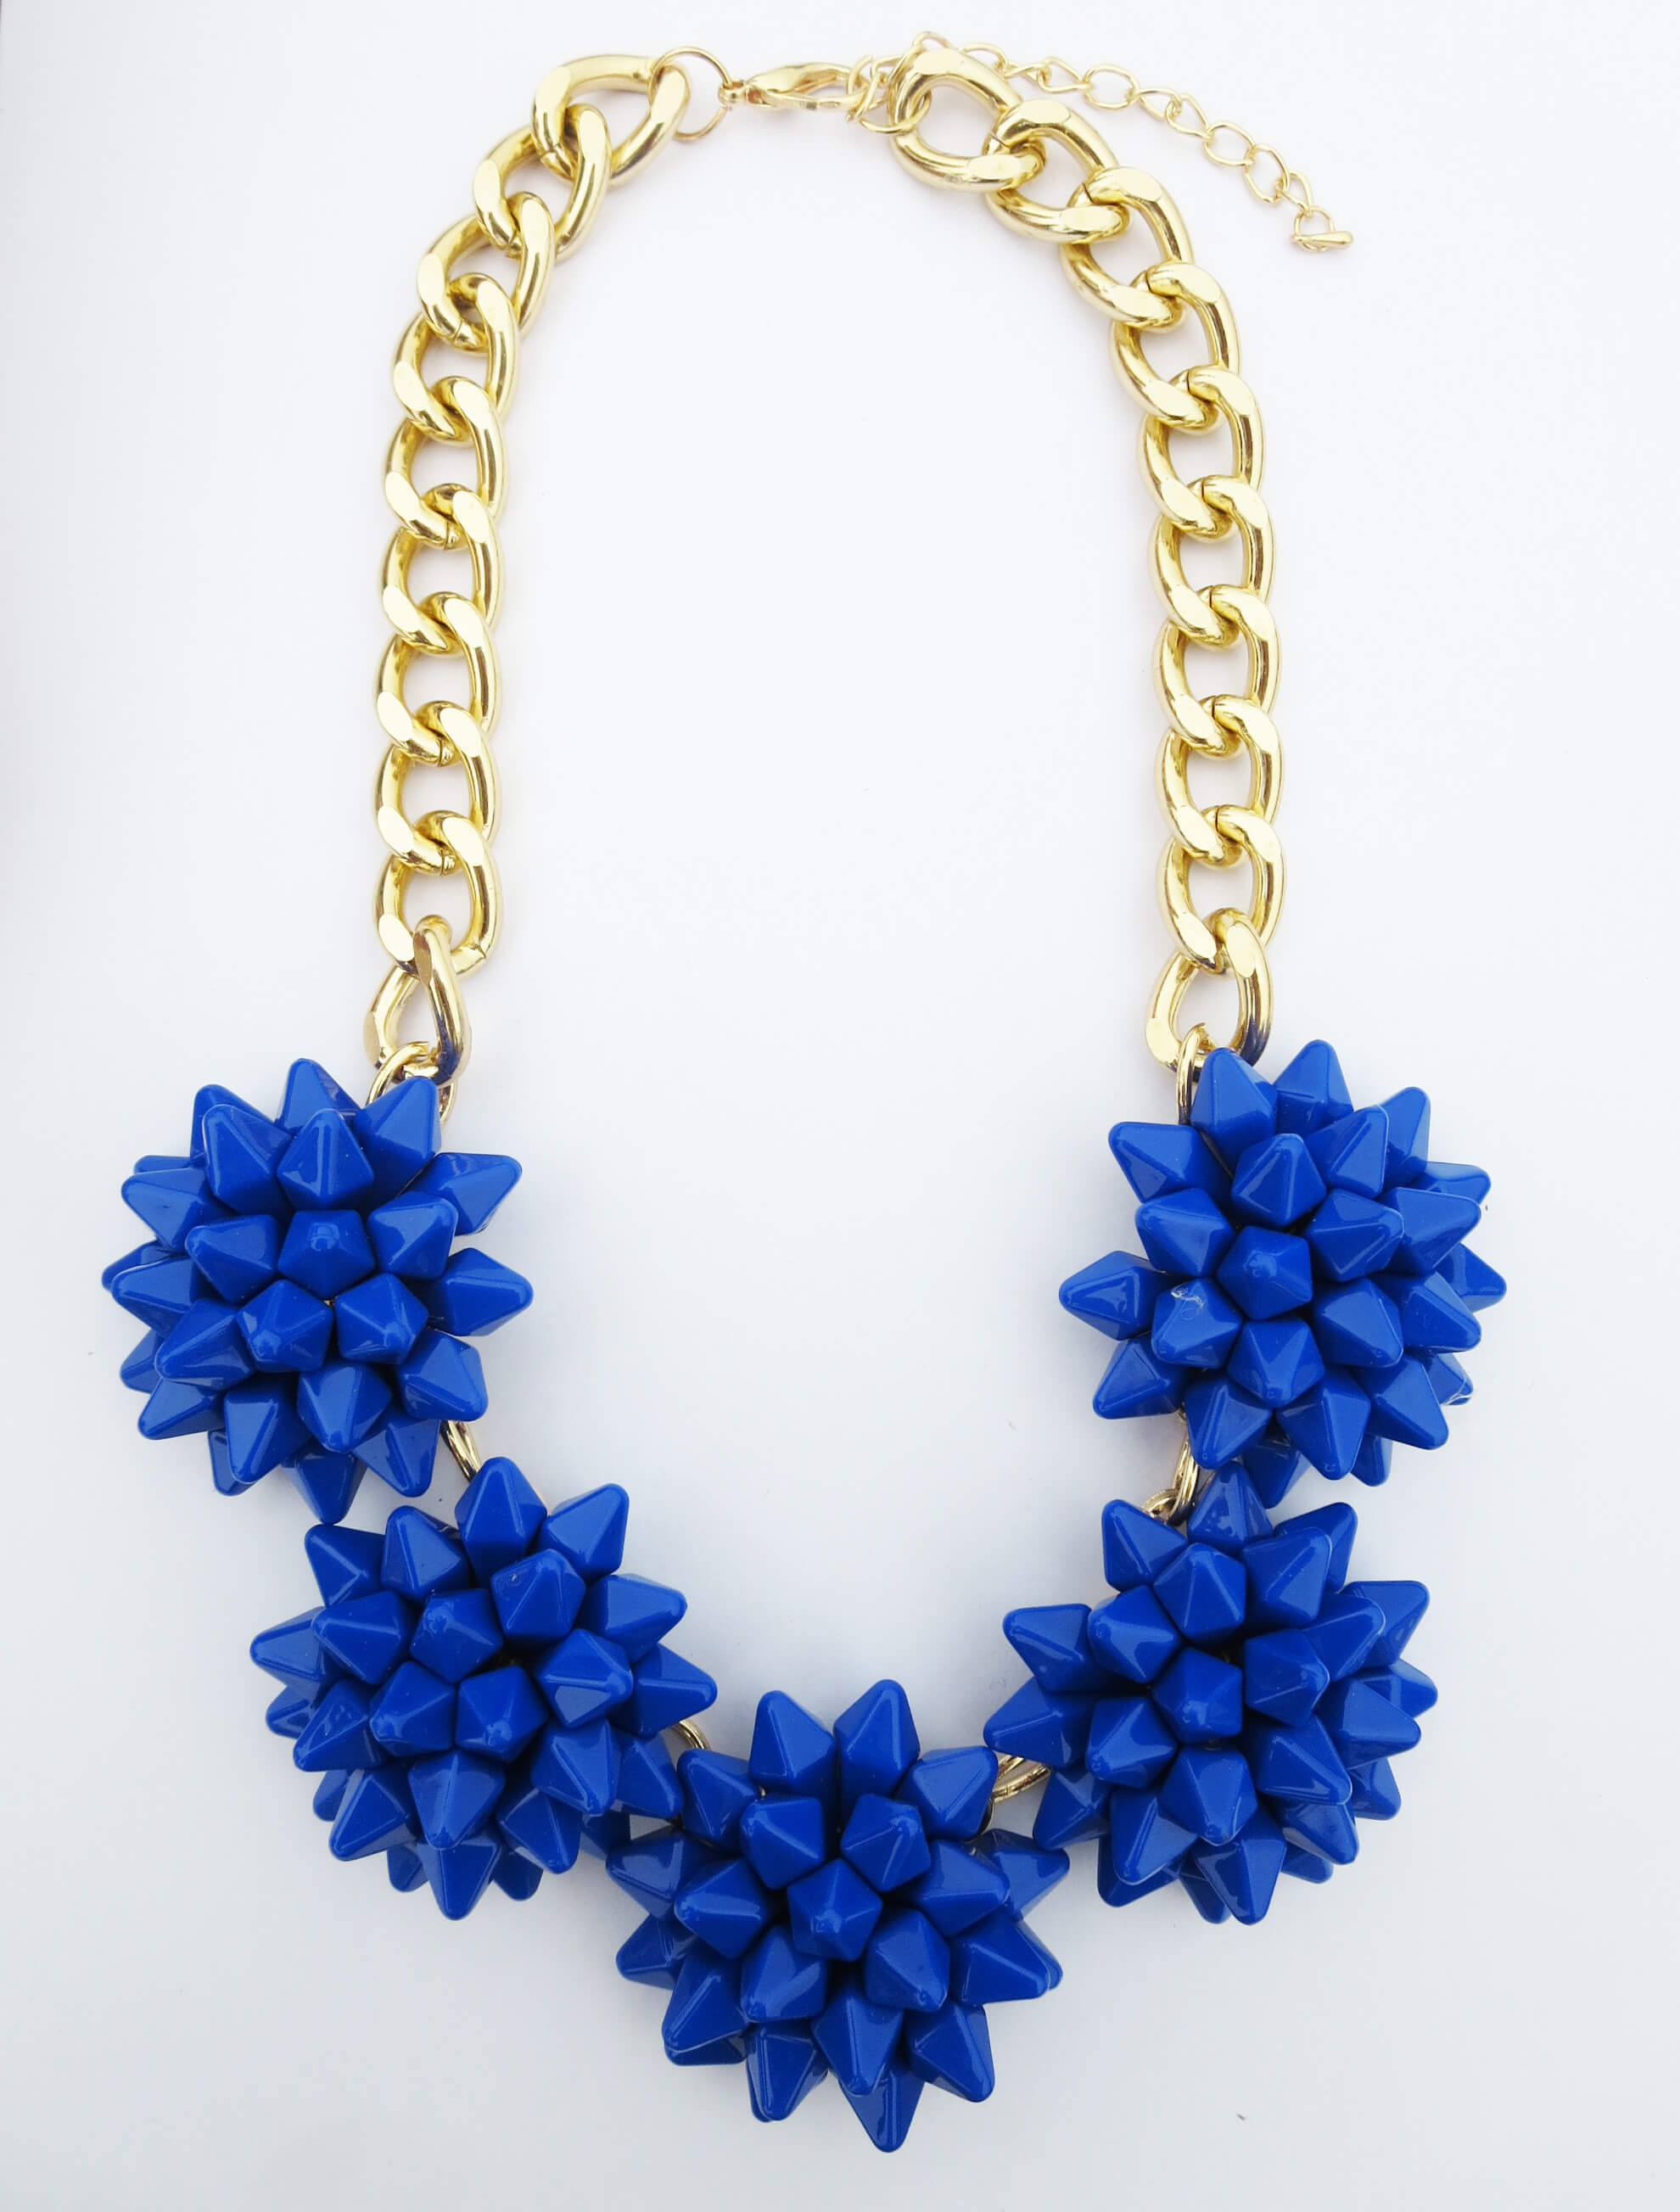 Fashion Jewellery: Fashion Jewelry Statement Necklace